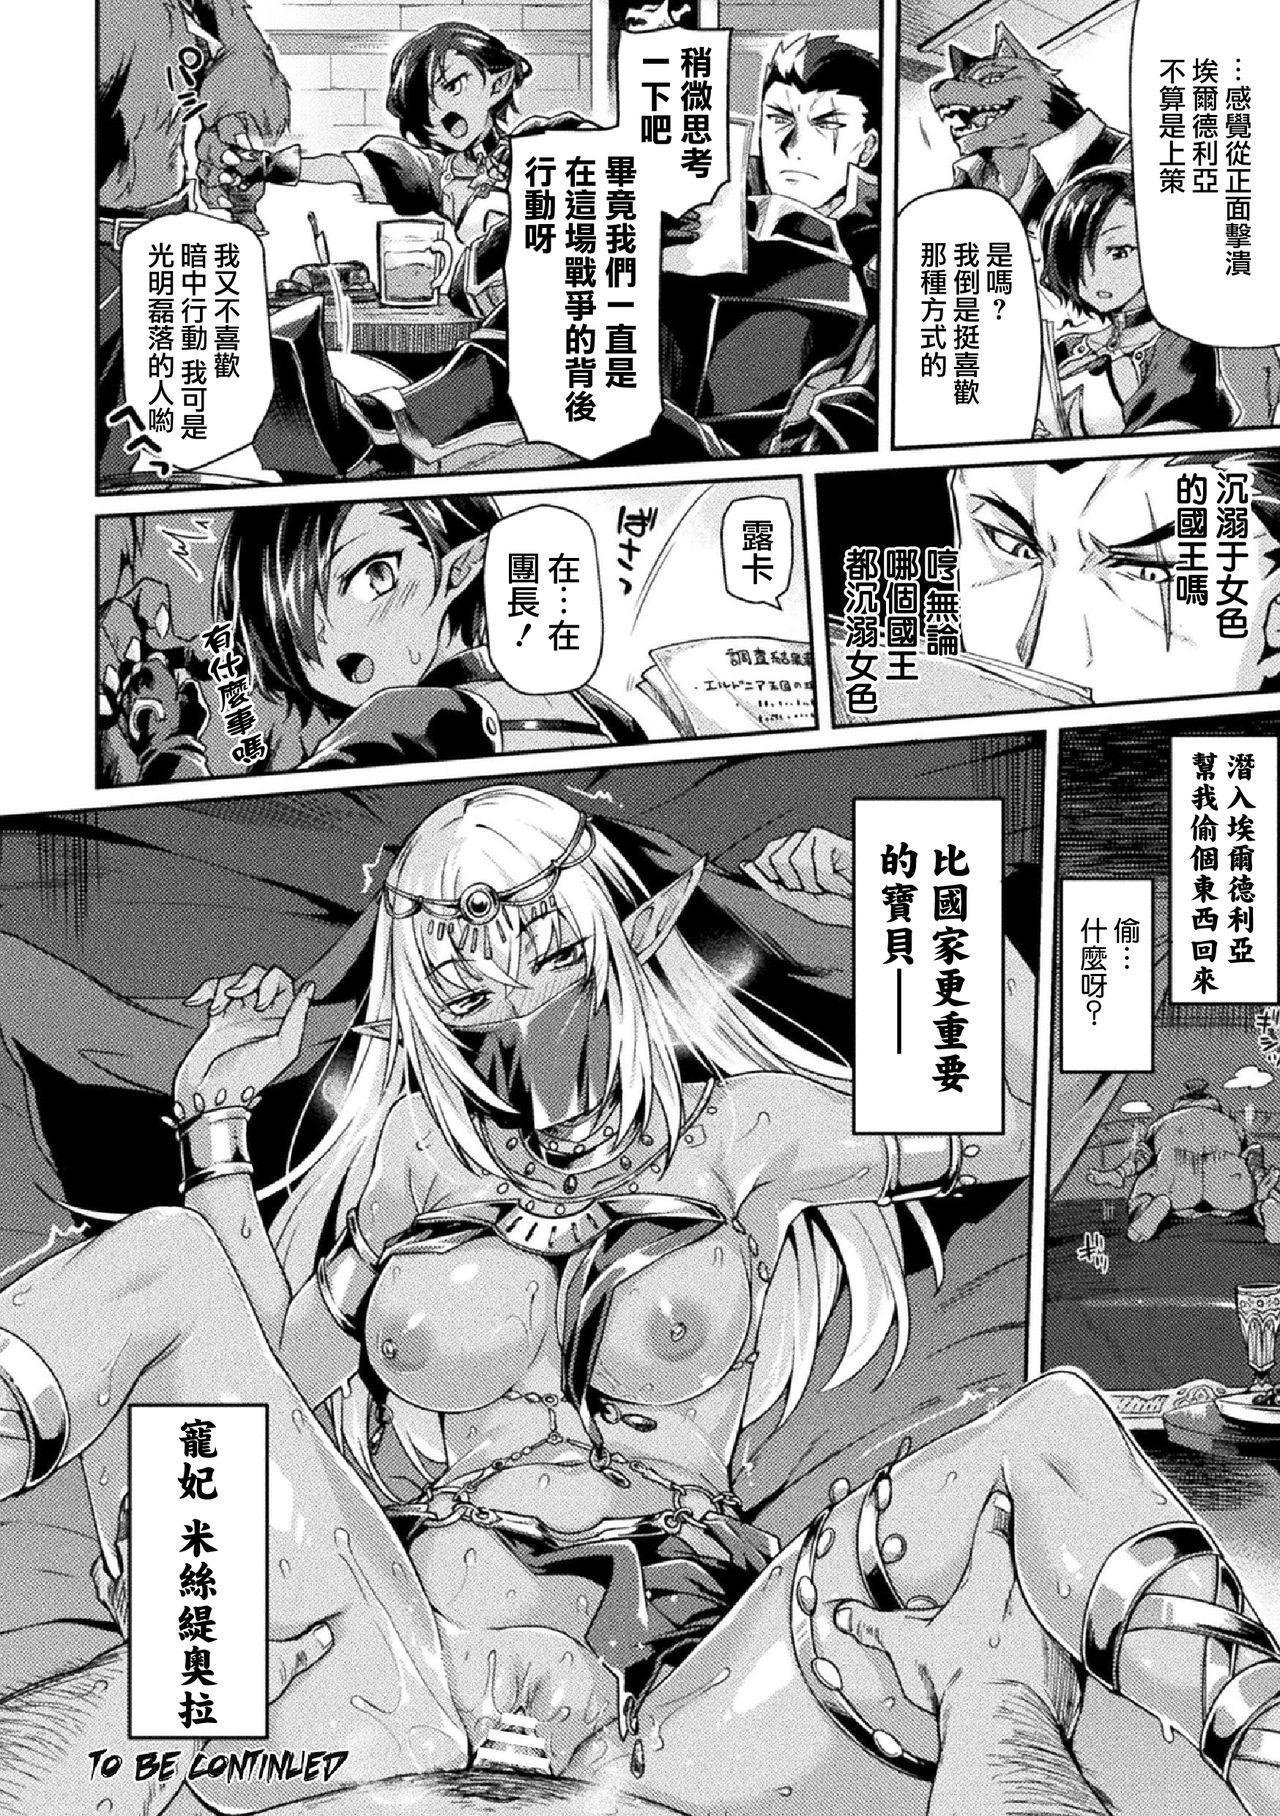 [Tsukitokage] Kuroinu II ~Inyoku ni Somaru Haitoku no Miyako, Futatabi~ THE COMIC Chapter 5 (Kukkoro Heroines Vol. 5) [Digital] [Chinese] [鬼畜王漢化組] [Digital] 20